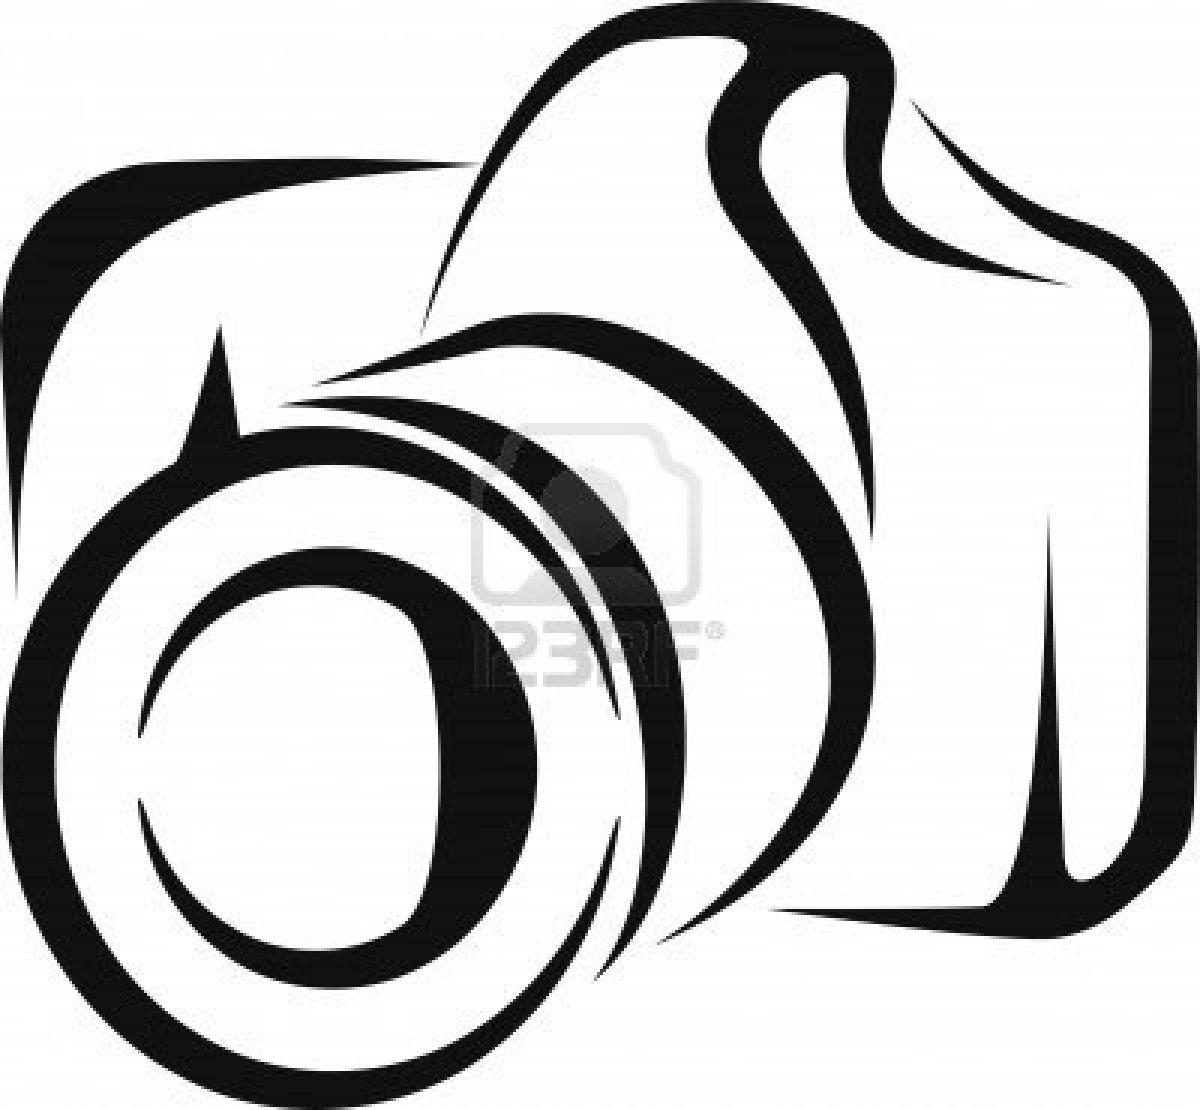 Camera Clip Art For Logo-camera clip art for logo-3